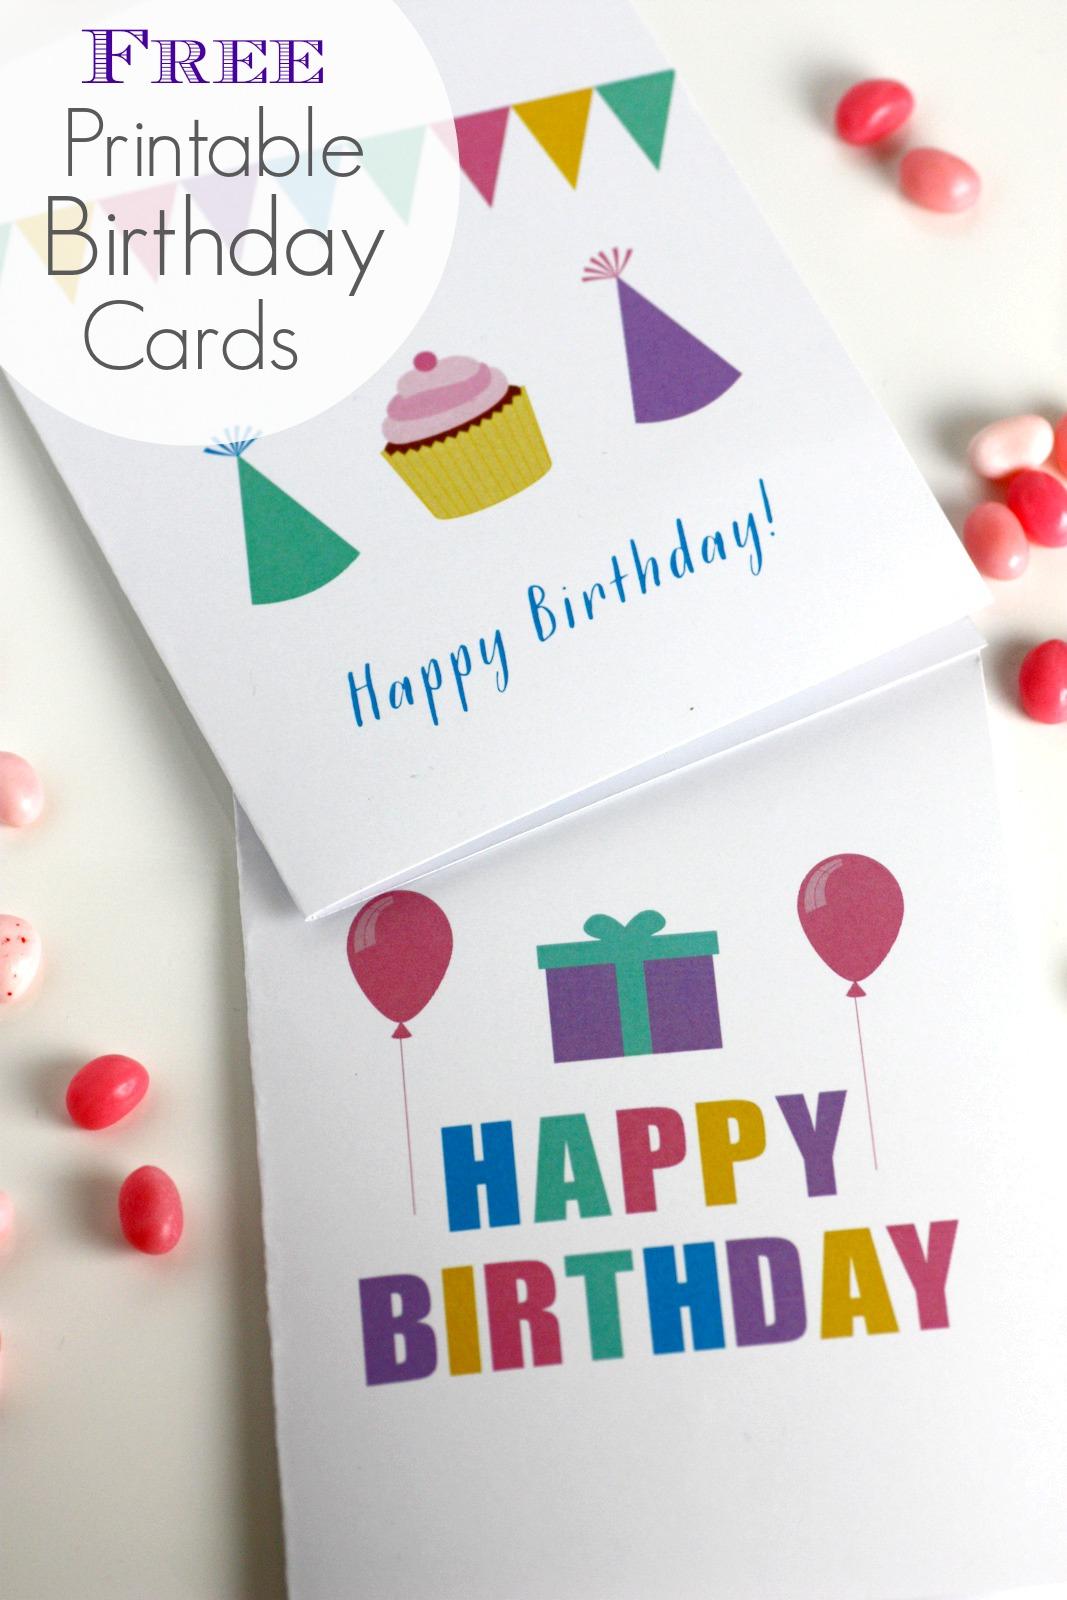 Free Printable Blank Birthday Cards   Catch My Party - Free Printable Birthday Cards For Adults